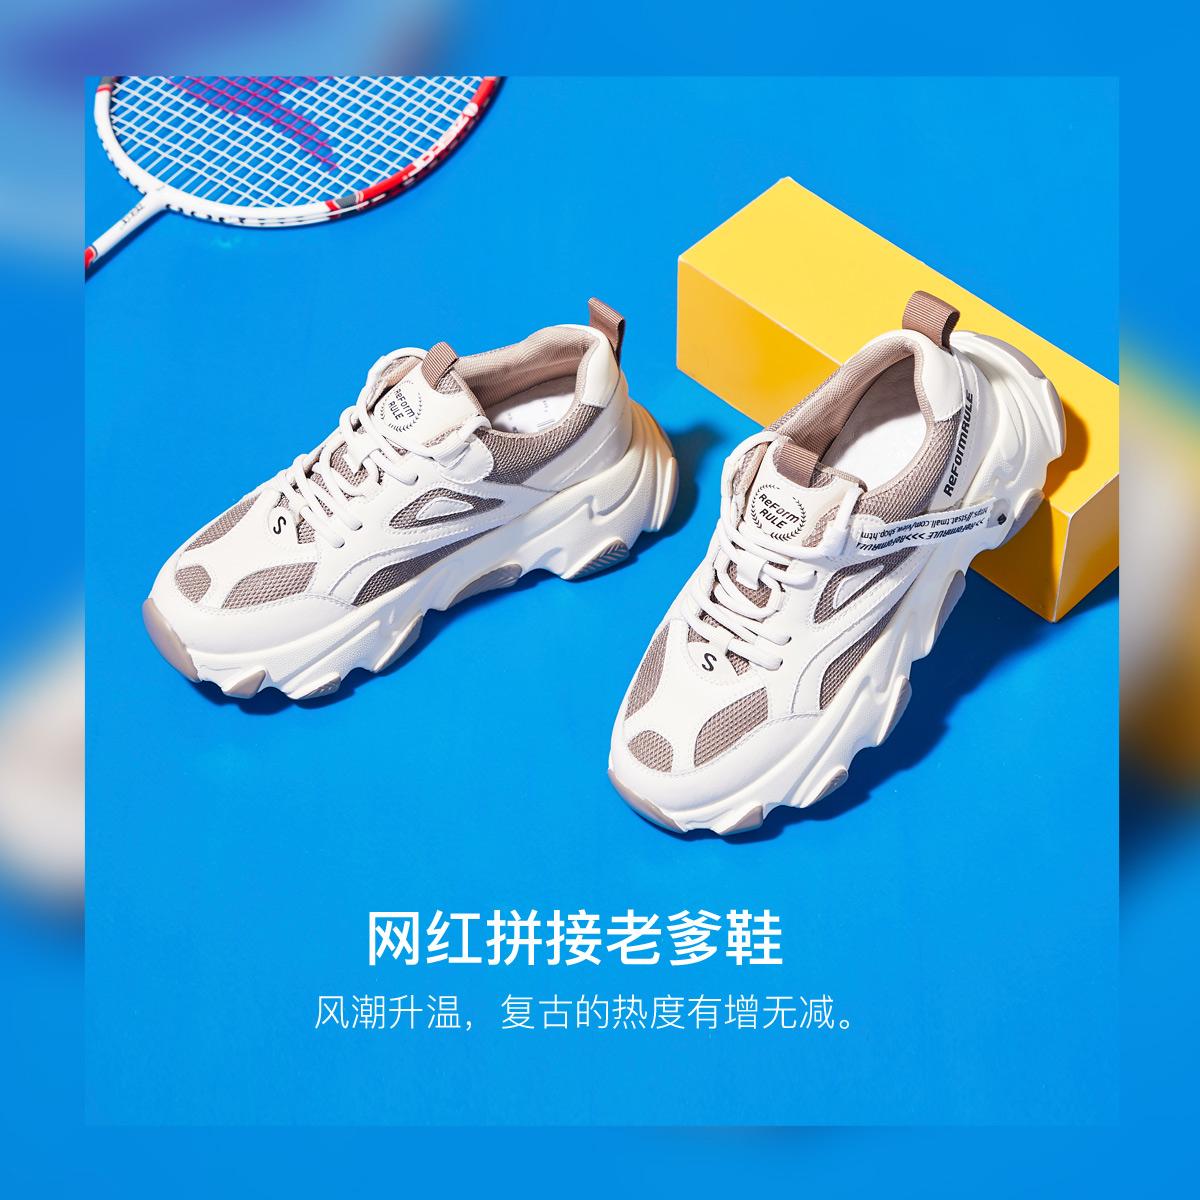 SS01112073 春秋商场同款厚底运动休闲鞋女网红老爹鞋 2020 星期六